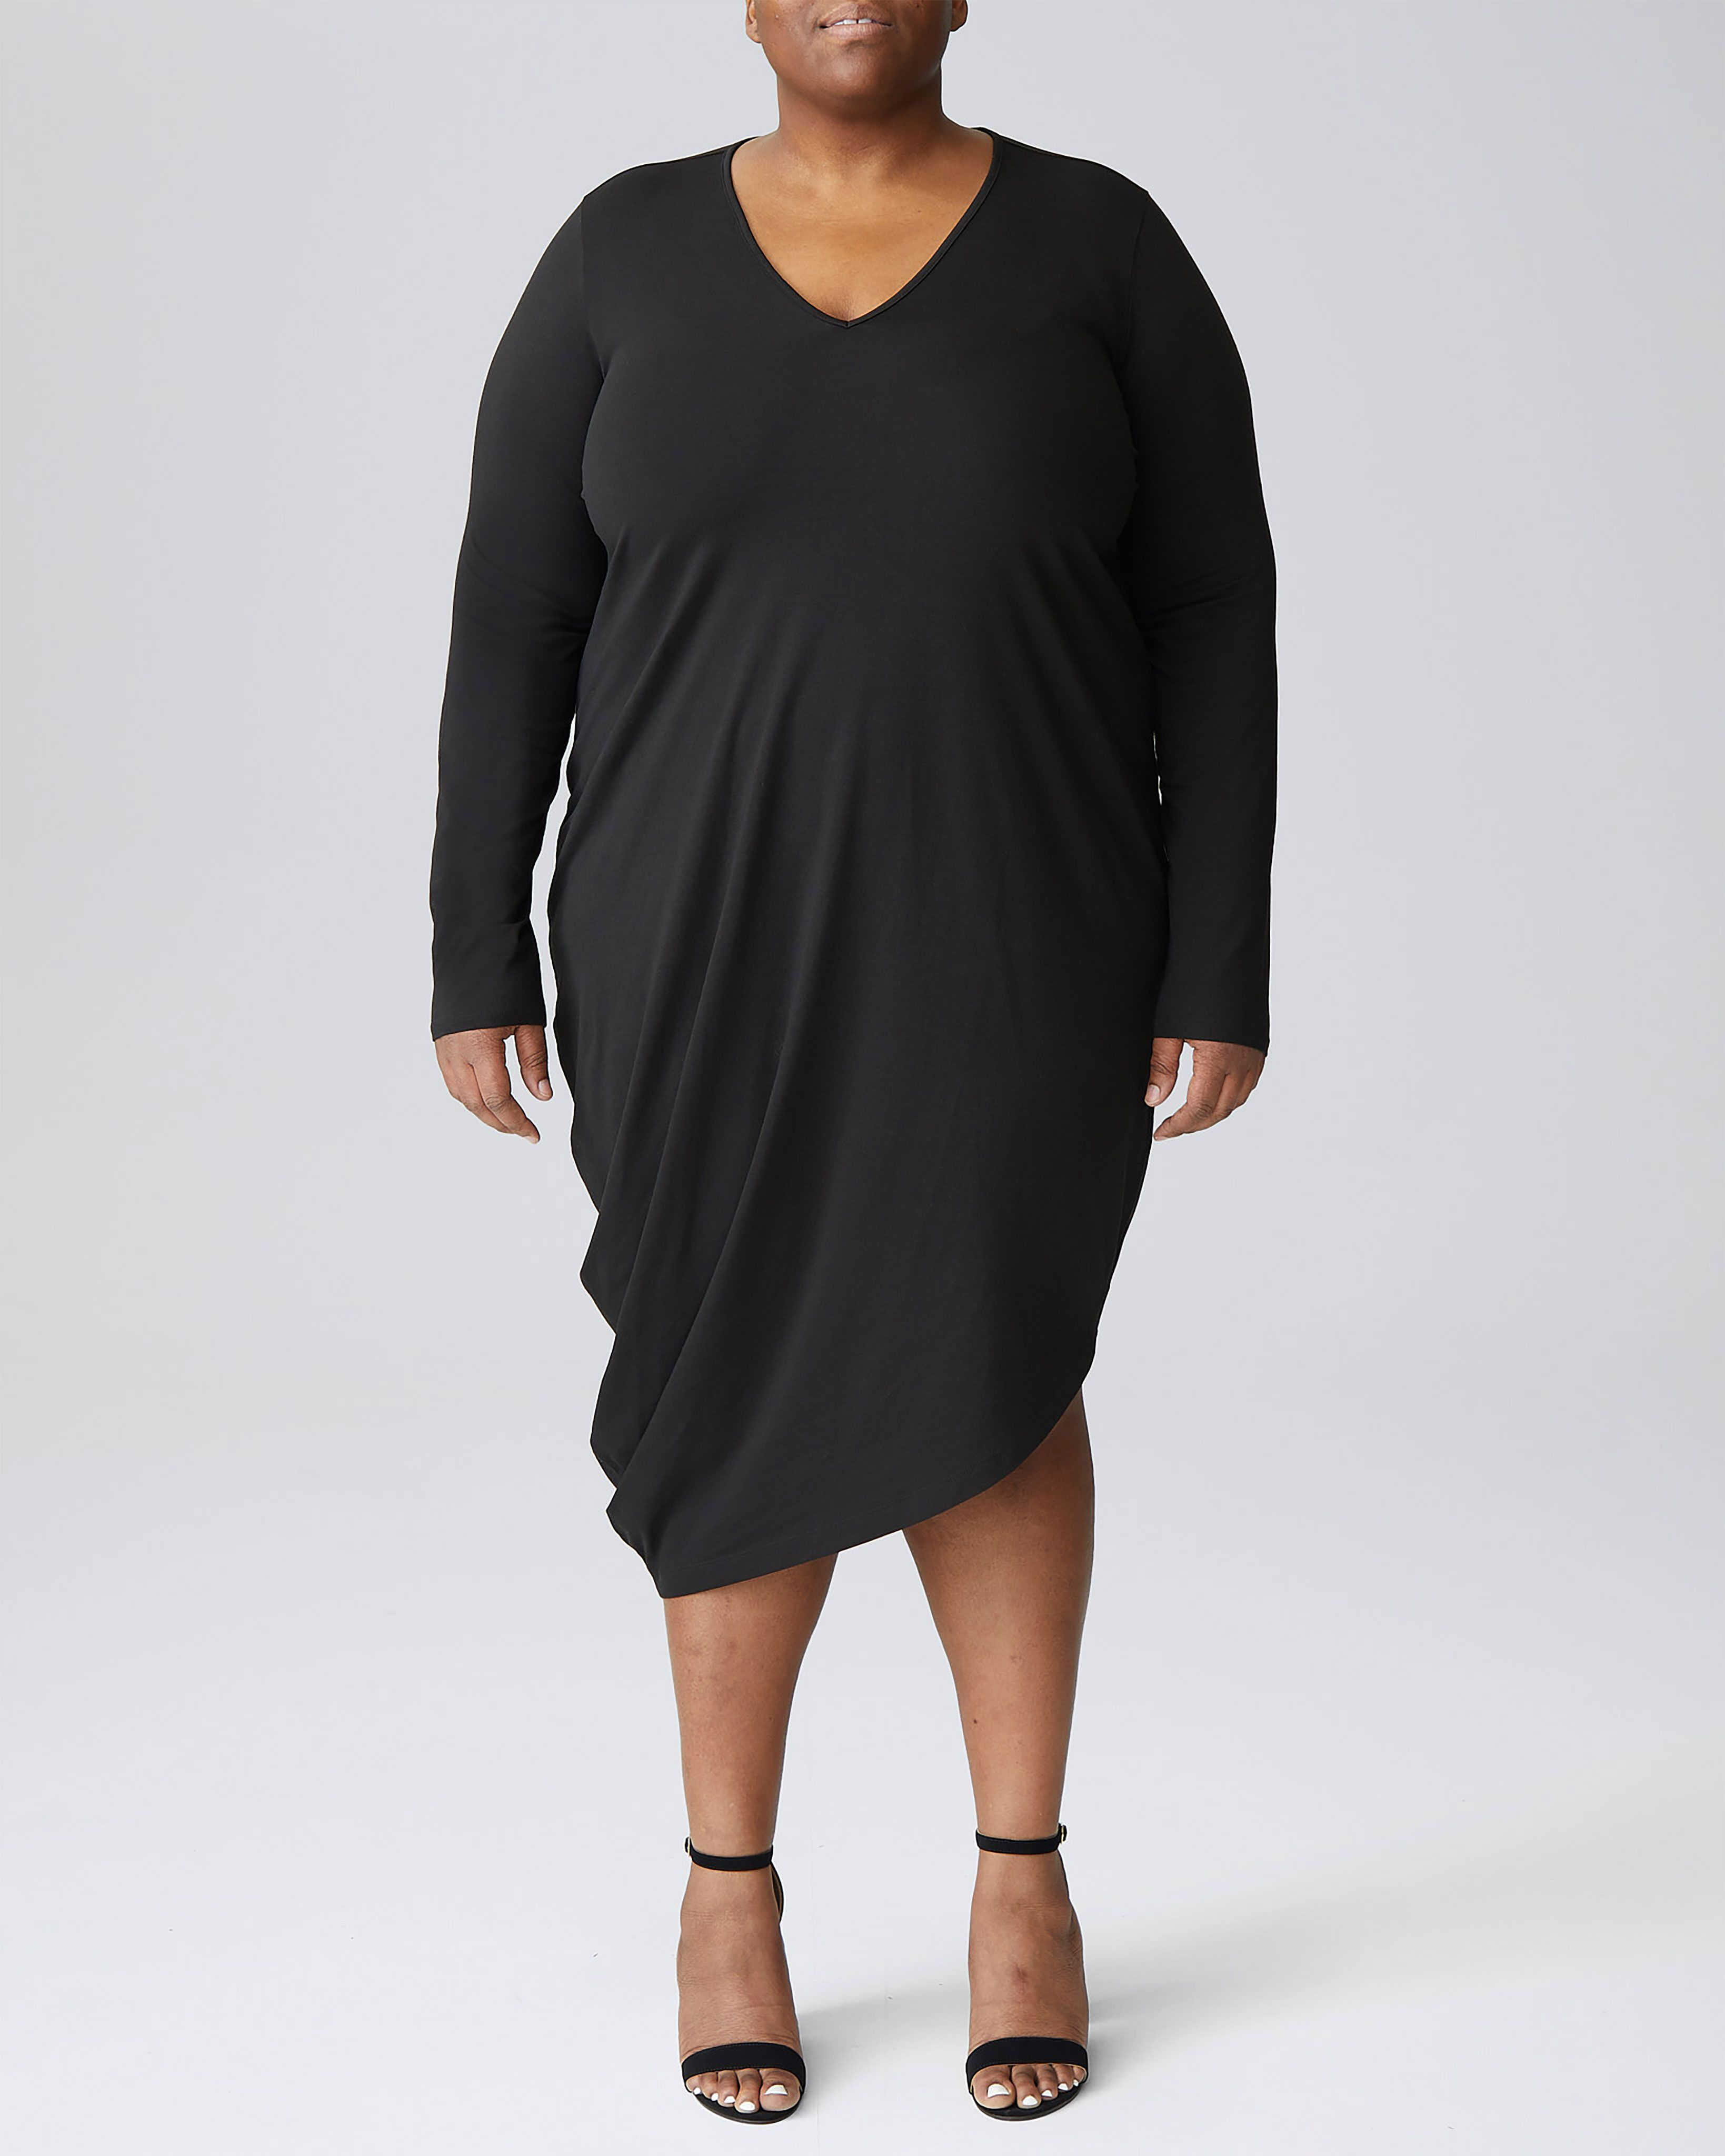 Long Sleeve V-Neck Geneva Dress - Berry